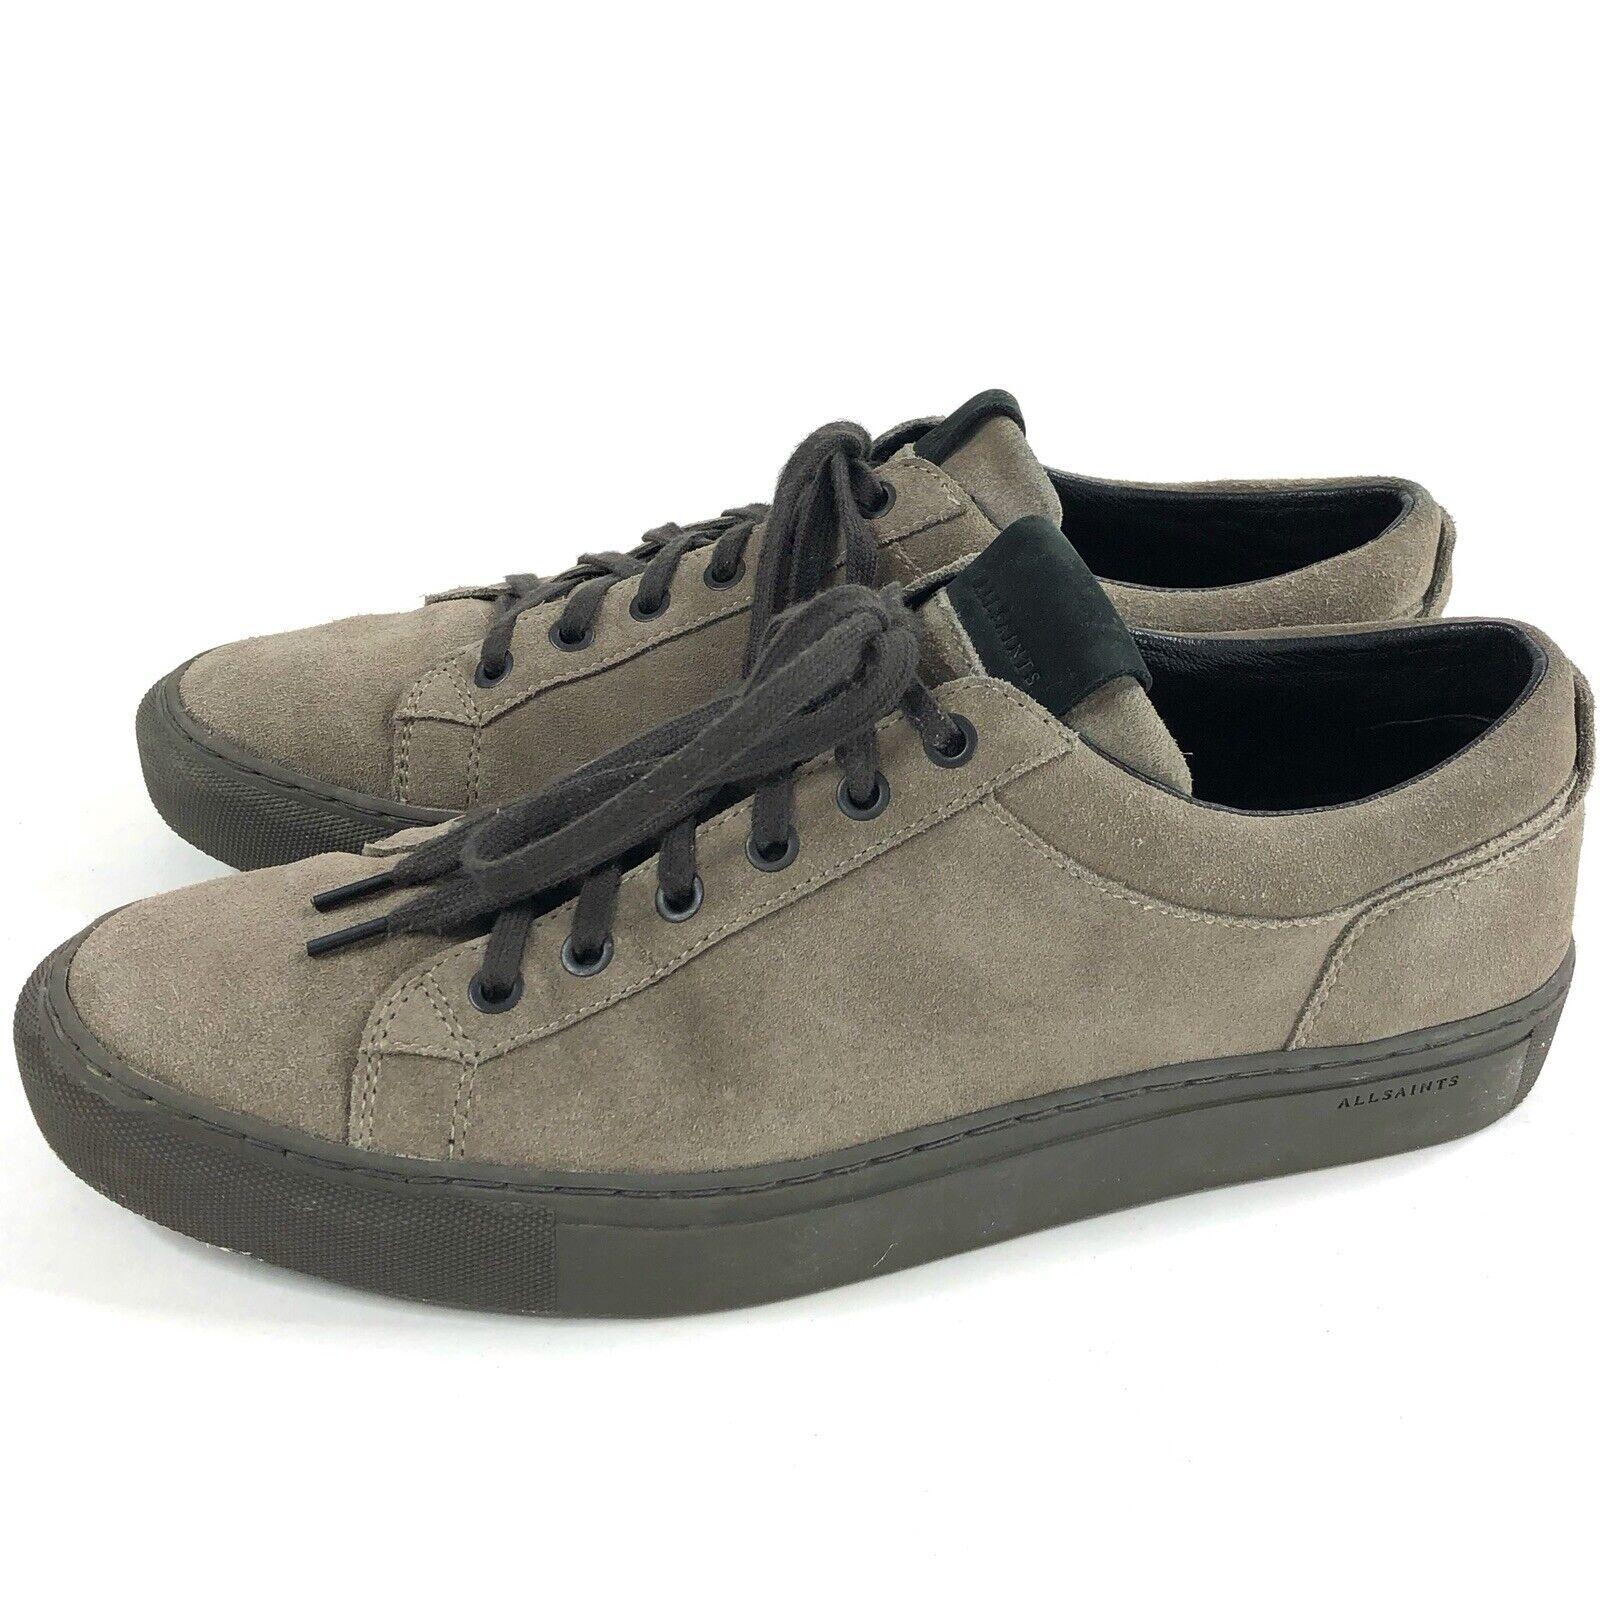 Tutti i Santi Suede scarpe da ginnastica Mens Dimensione  11 EU44 Low Top Lace Up Rubber Sole  negozio outlet